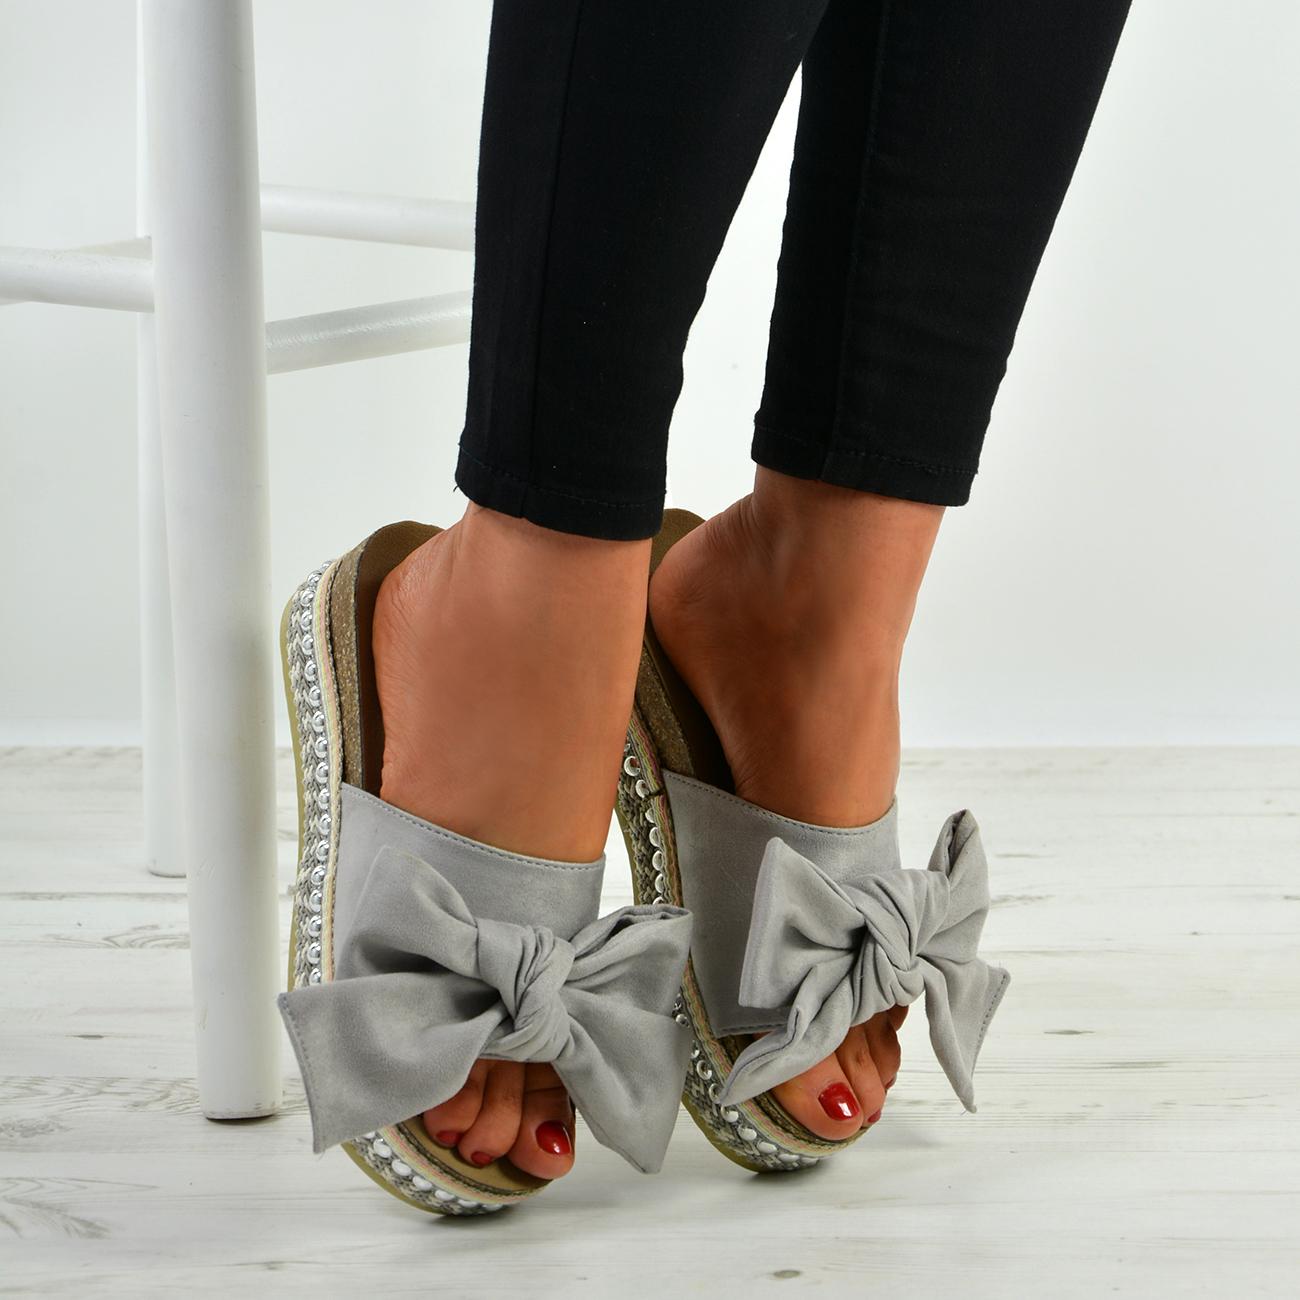 New-Womens-Bow-Flatform-Sandals-Peep-Toe-Ladies-Pearl-Stud-Wedges-Shoes-Platform